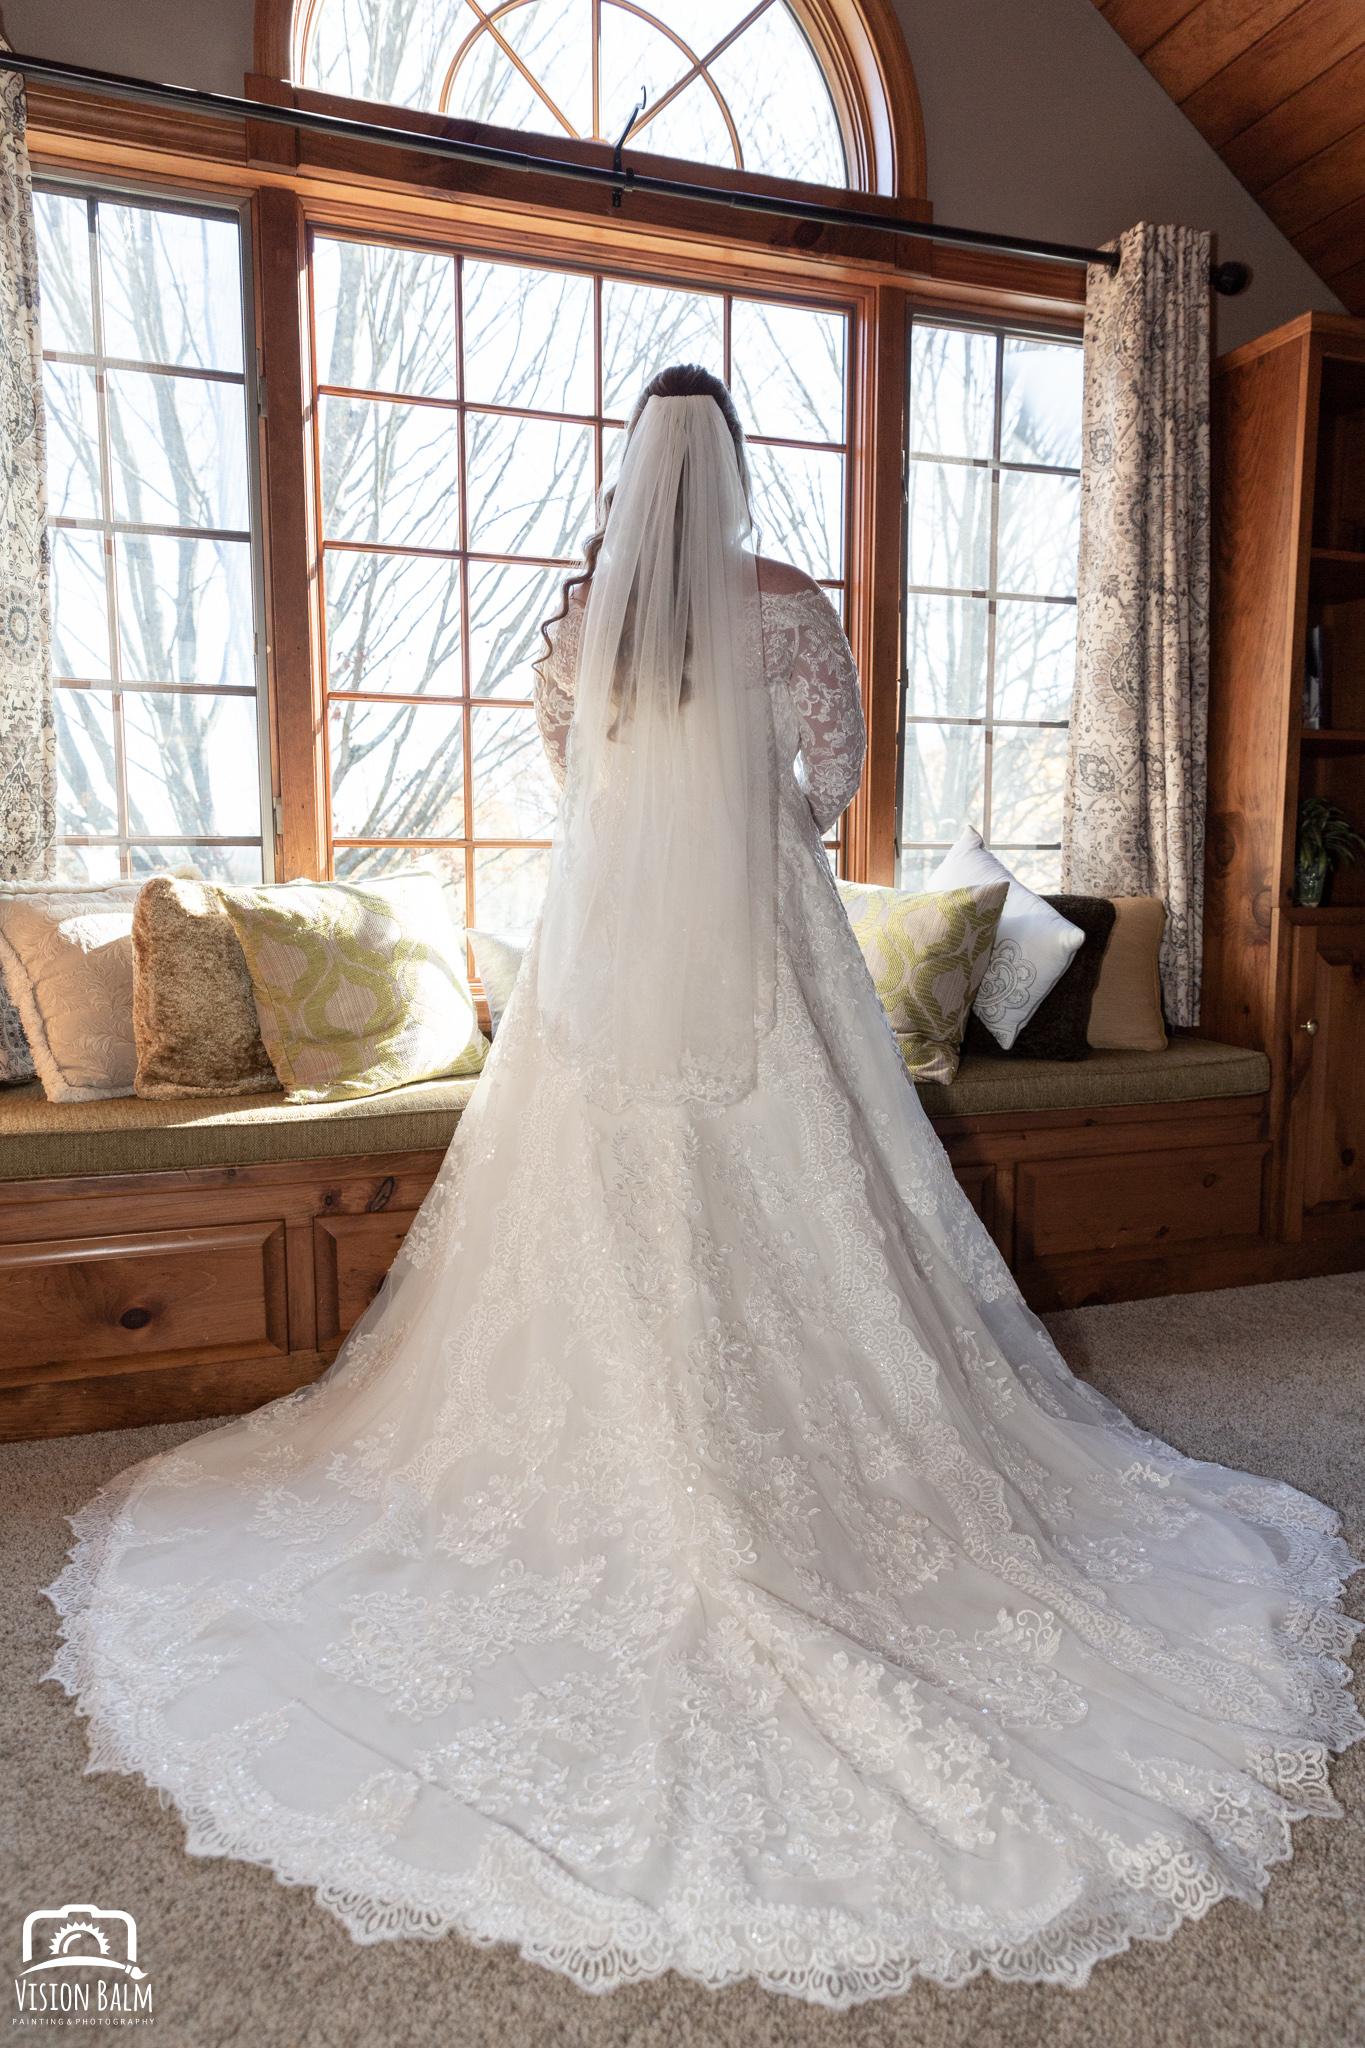 Lifestyle wedding photo of bride in her dress in Zuka's Hilltop Barn by Vision Balm in Charleston, SC.